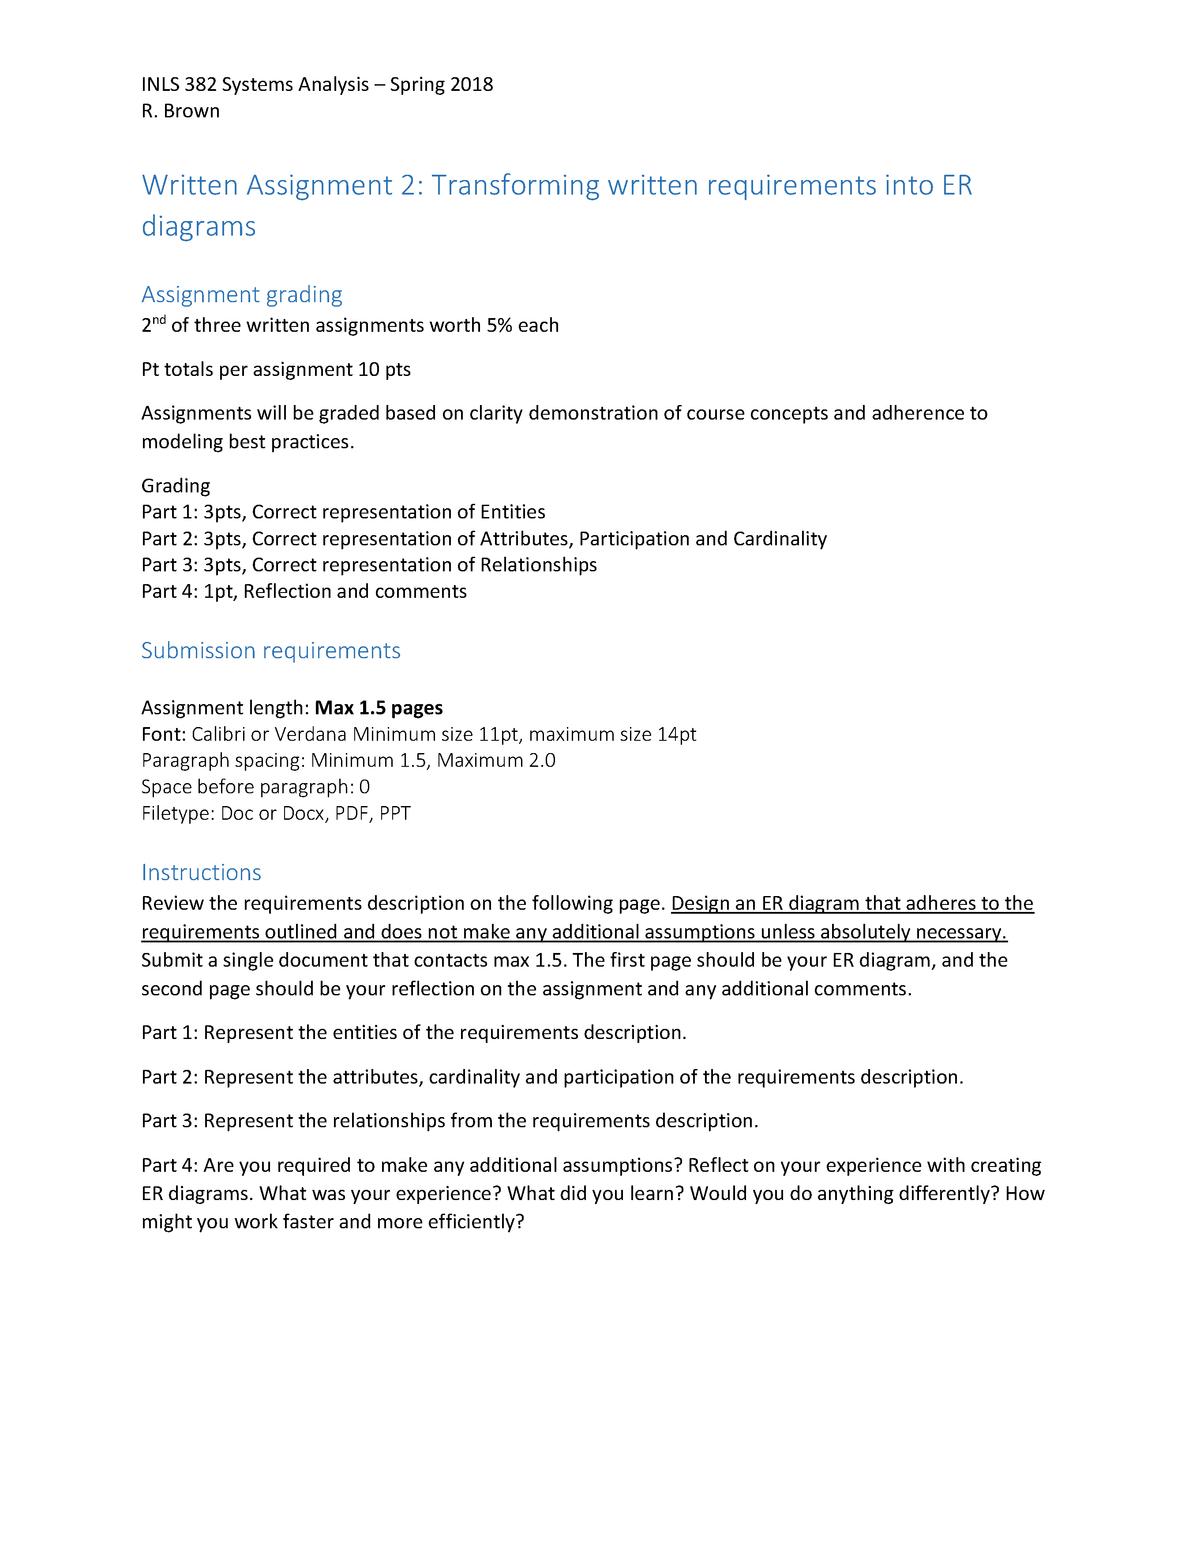 Written Assignment 2 - Regarding Er Diagram Drawing, Boat within Er Diagram Assumptions